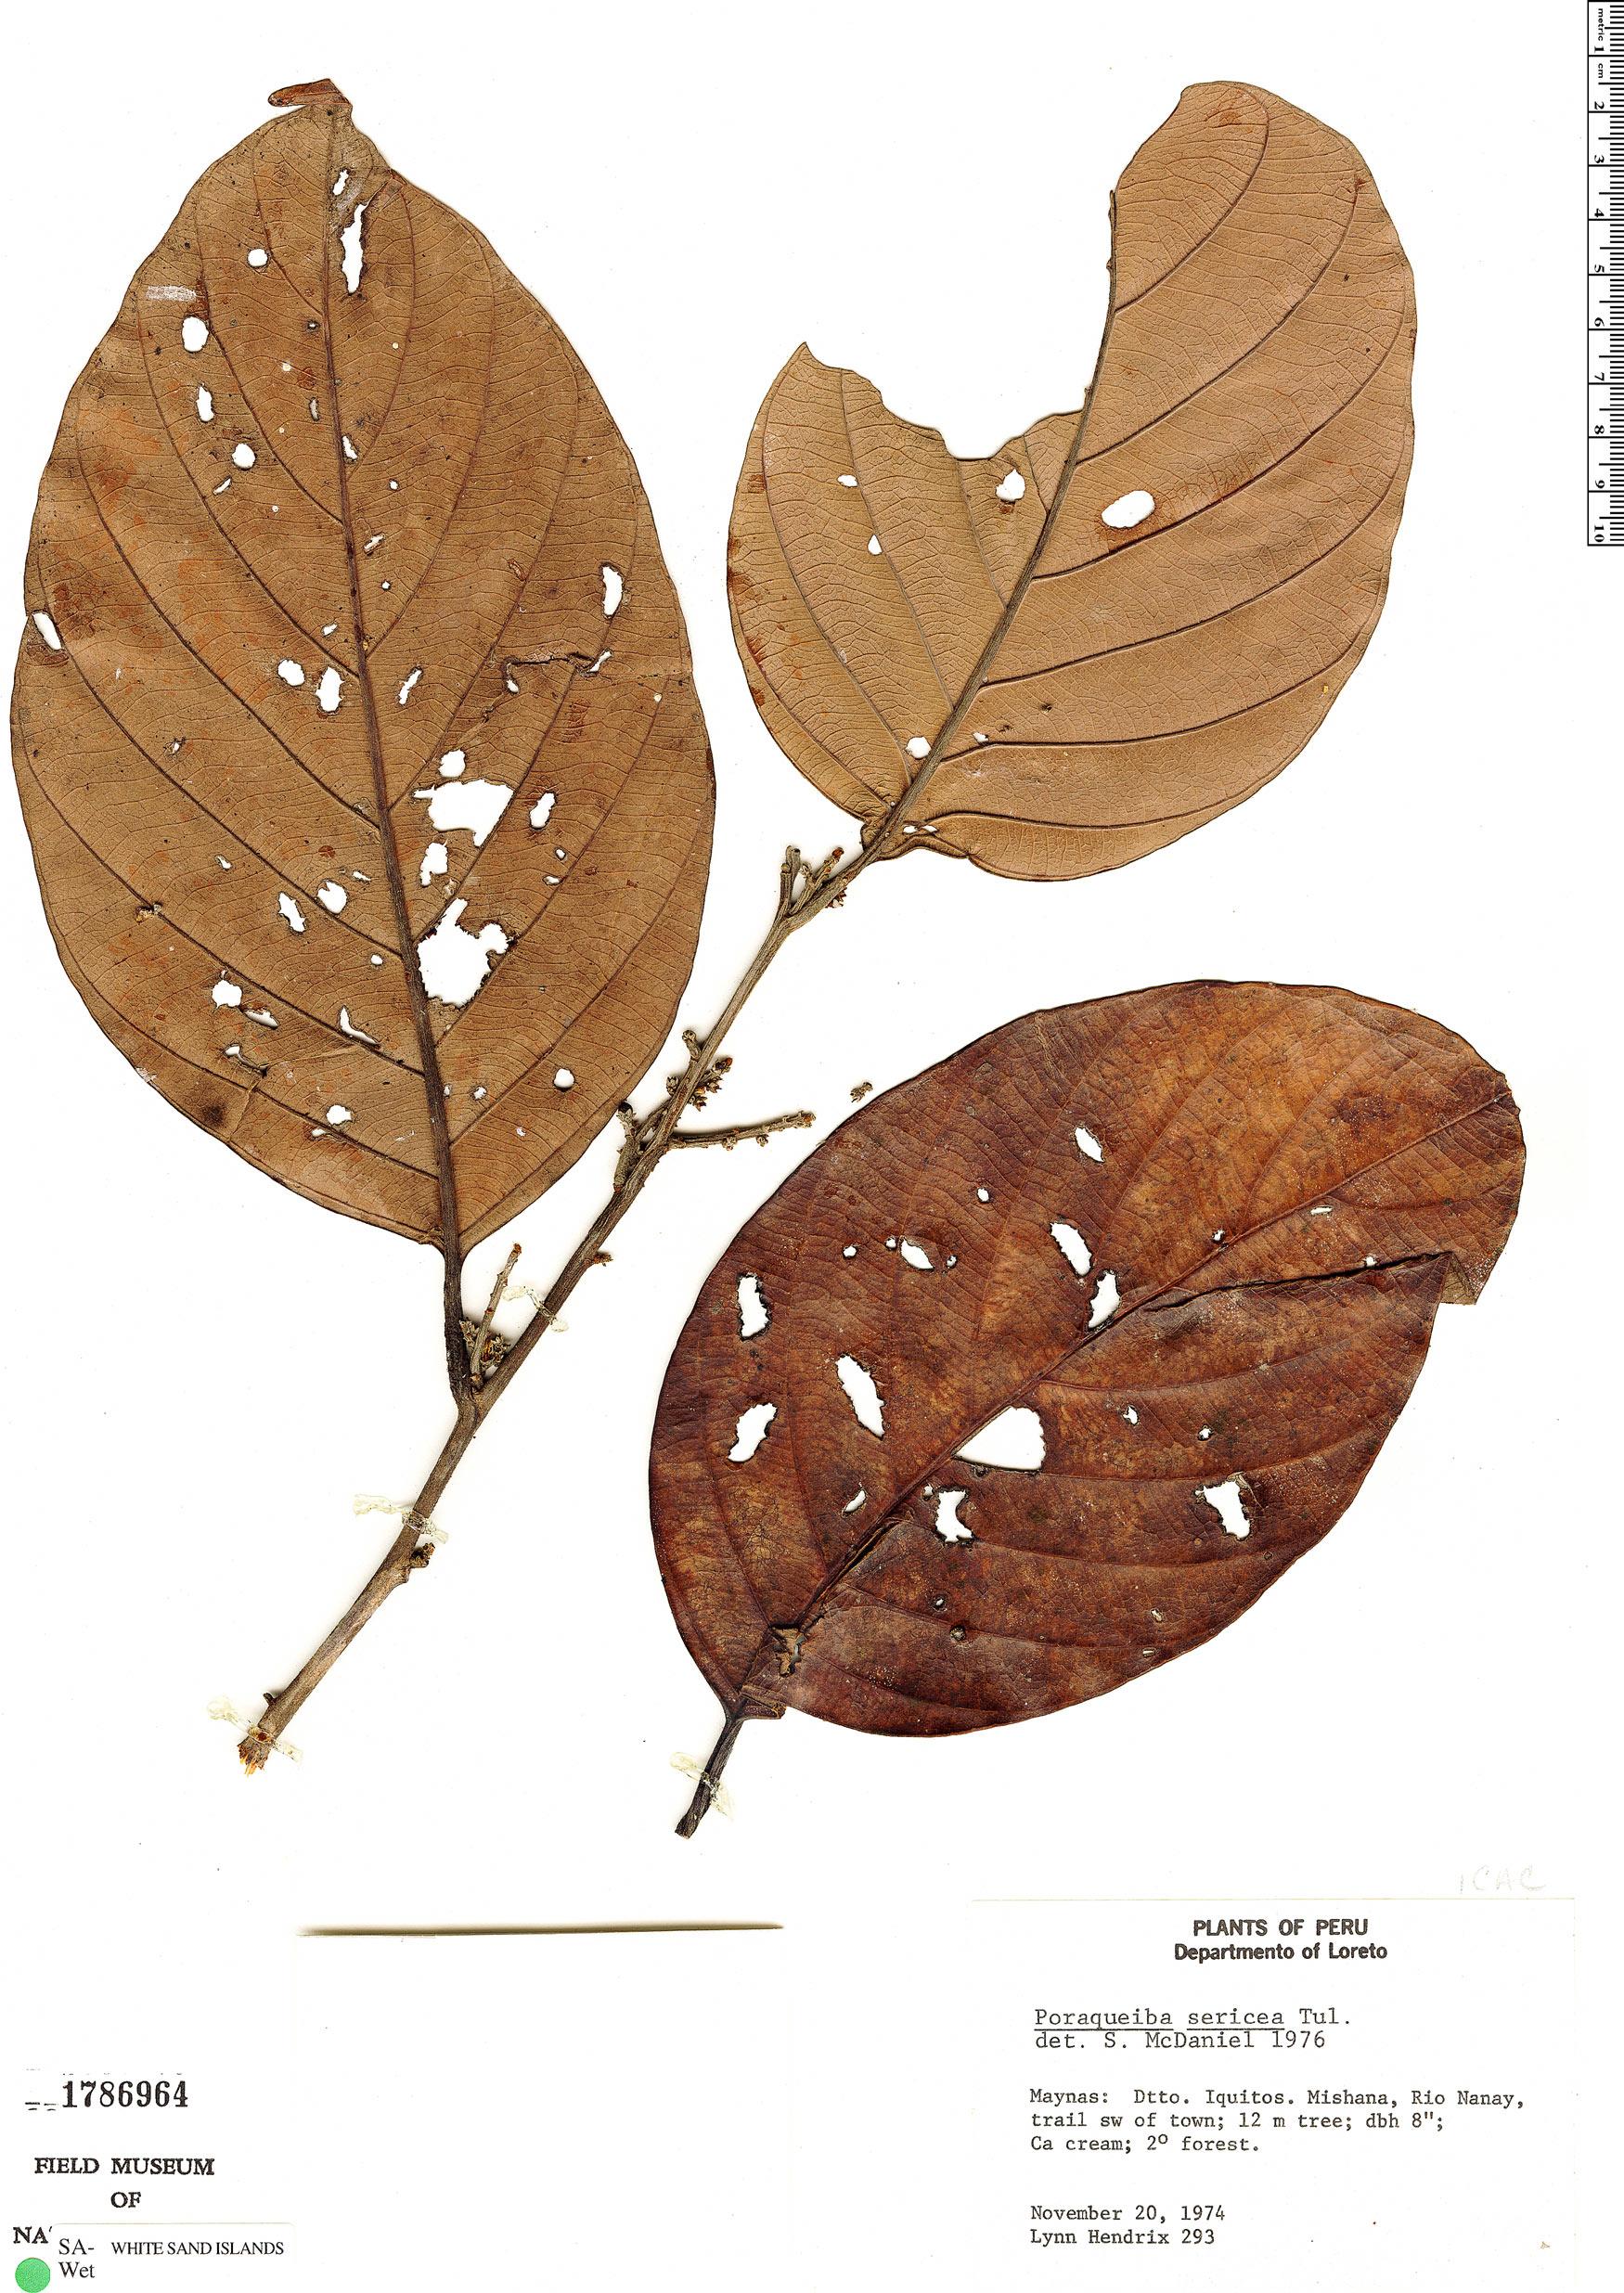 Specimen: Poraqueiba sericea